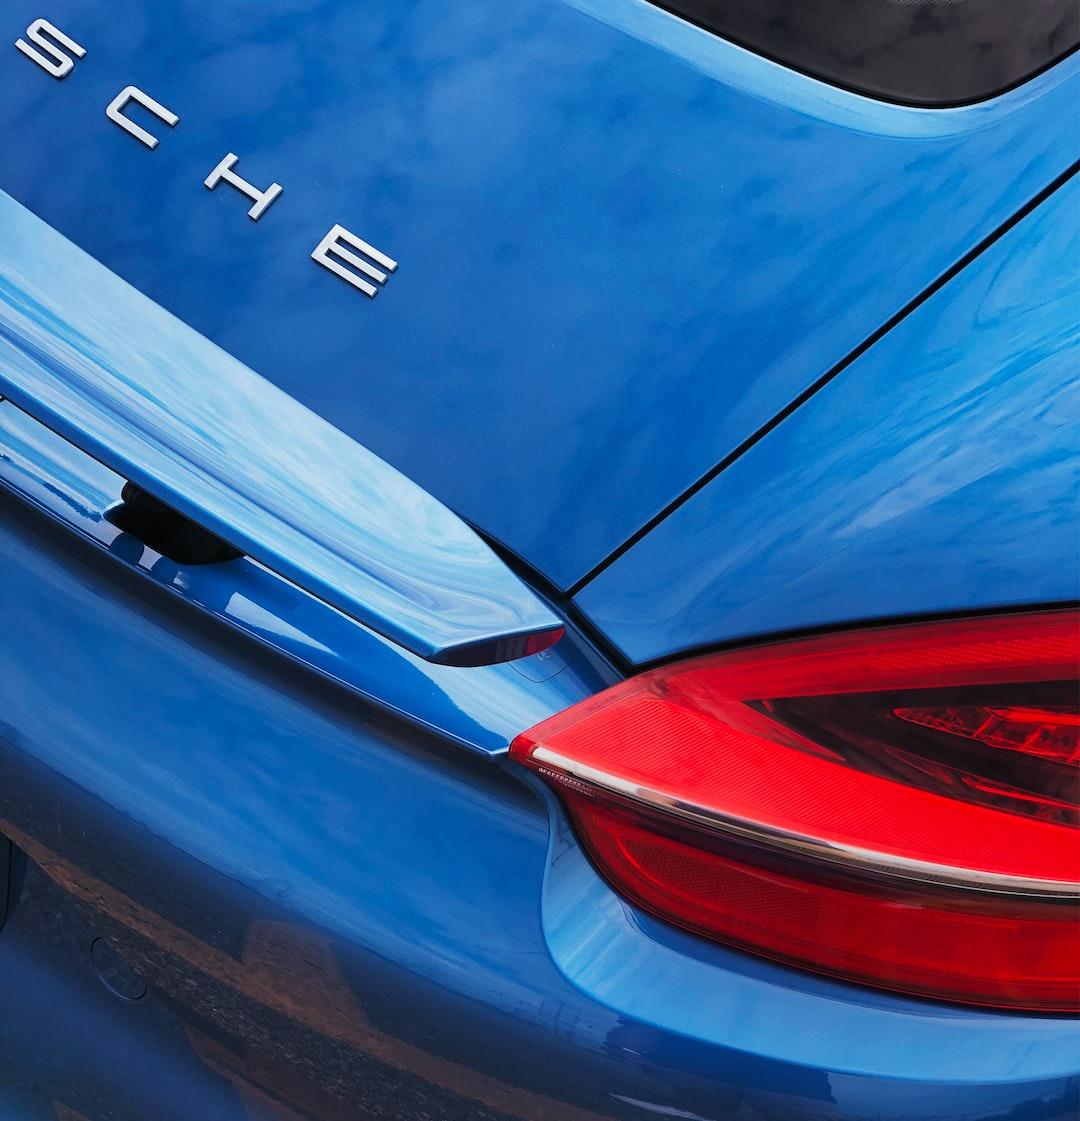 Blue Porsche by @beekay on Unsplash